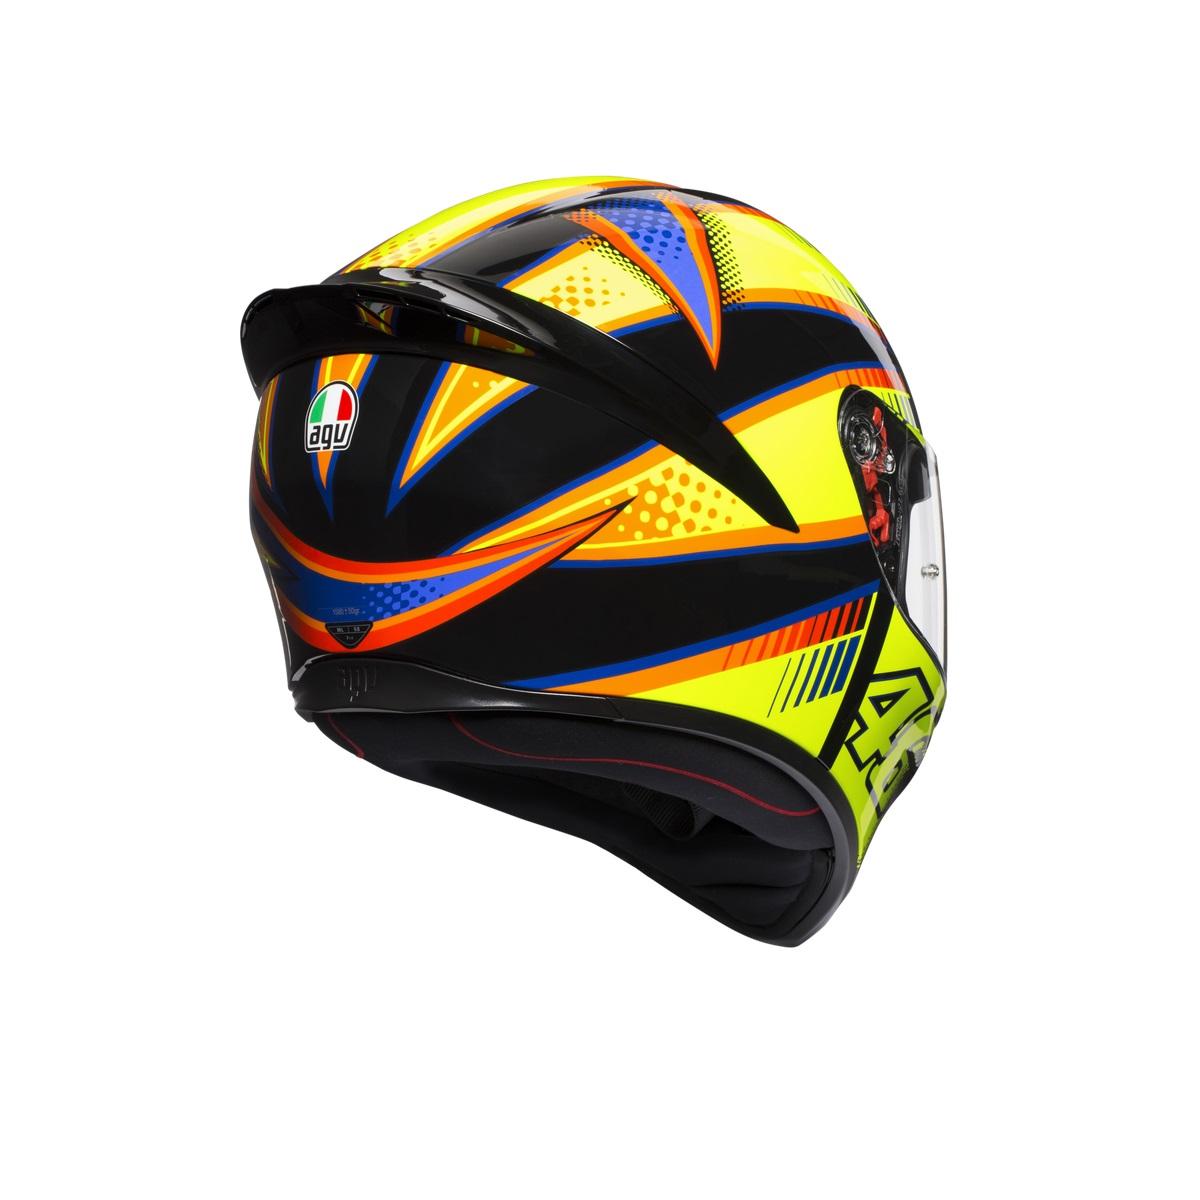 AGV K1 Soleluna 2015 Motorcycle Helmet Rossi